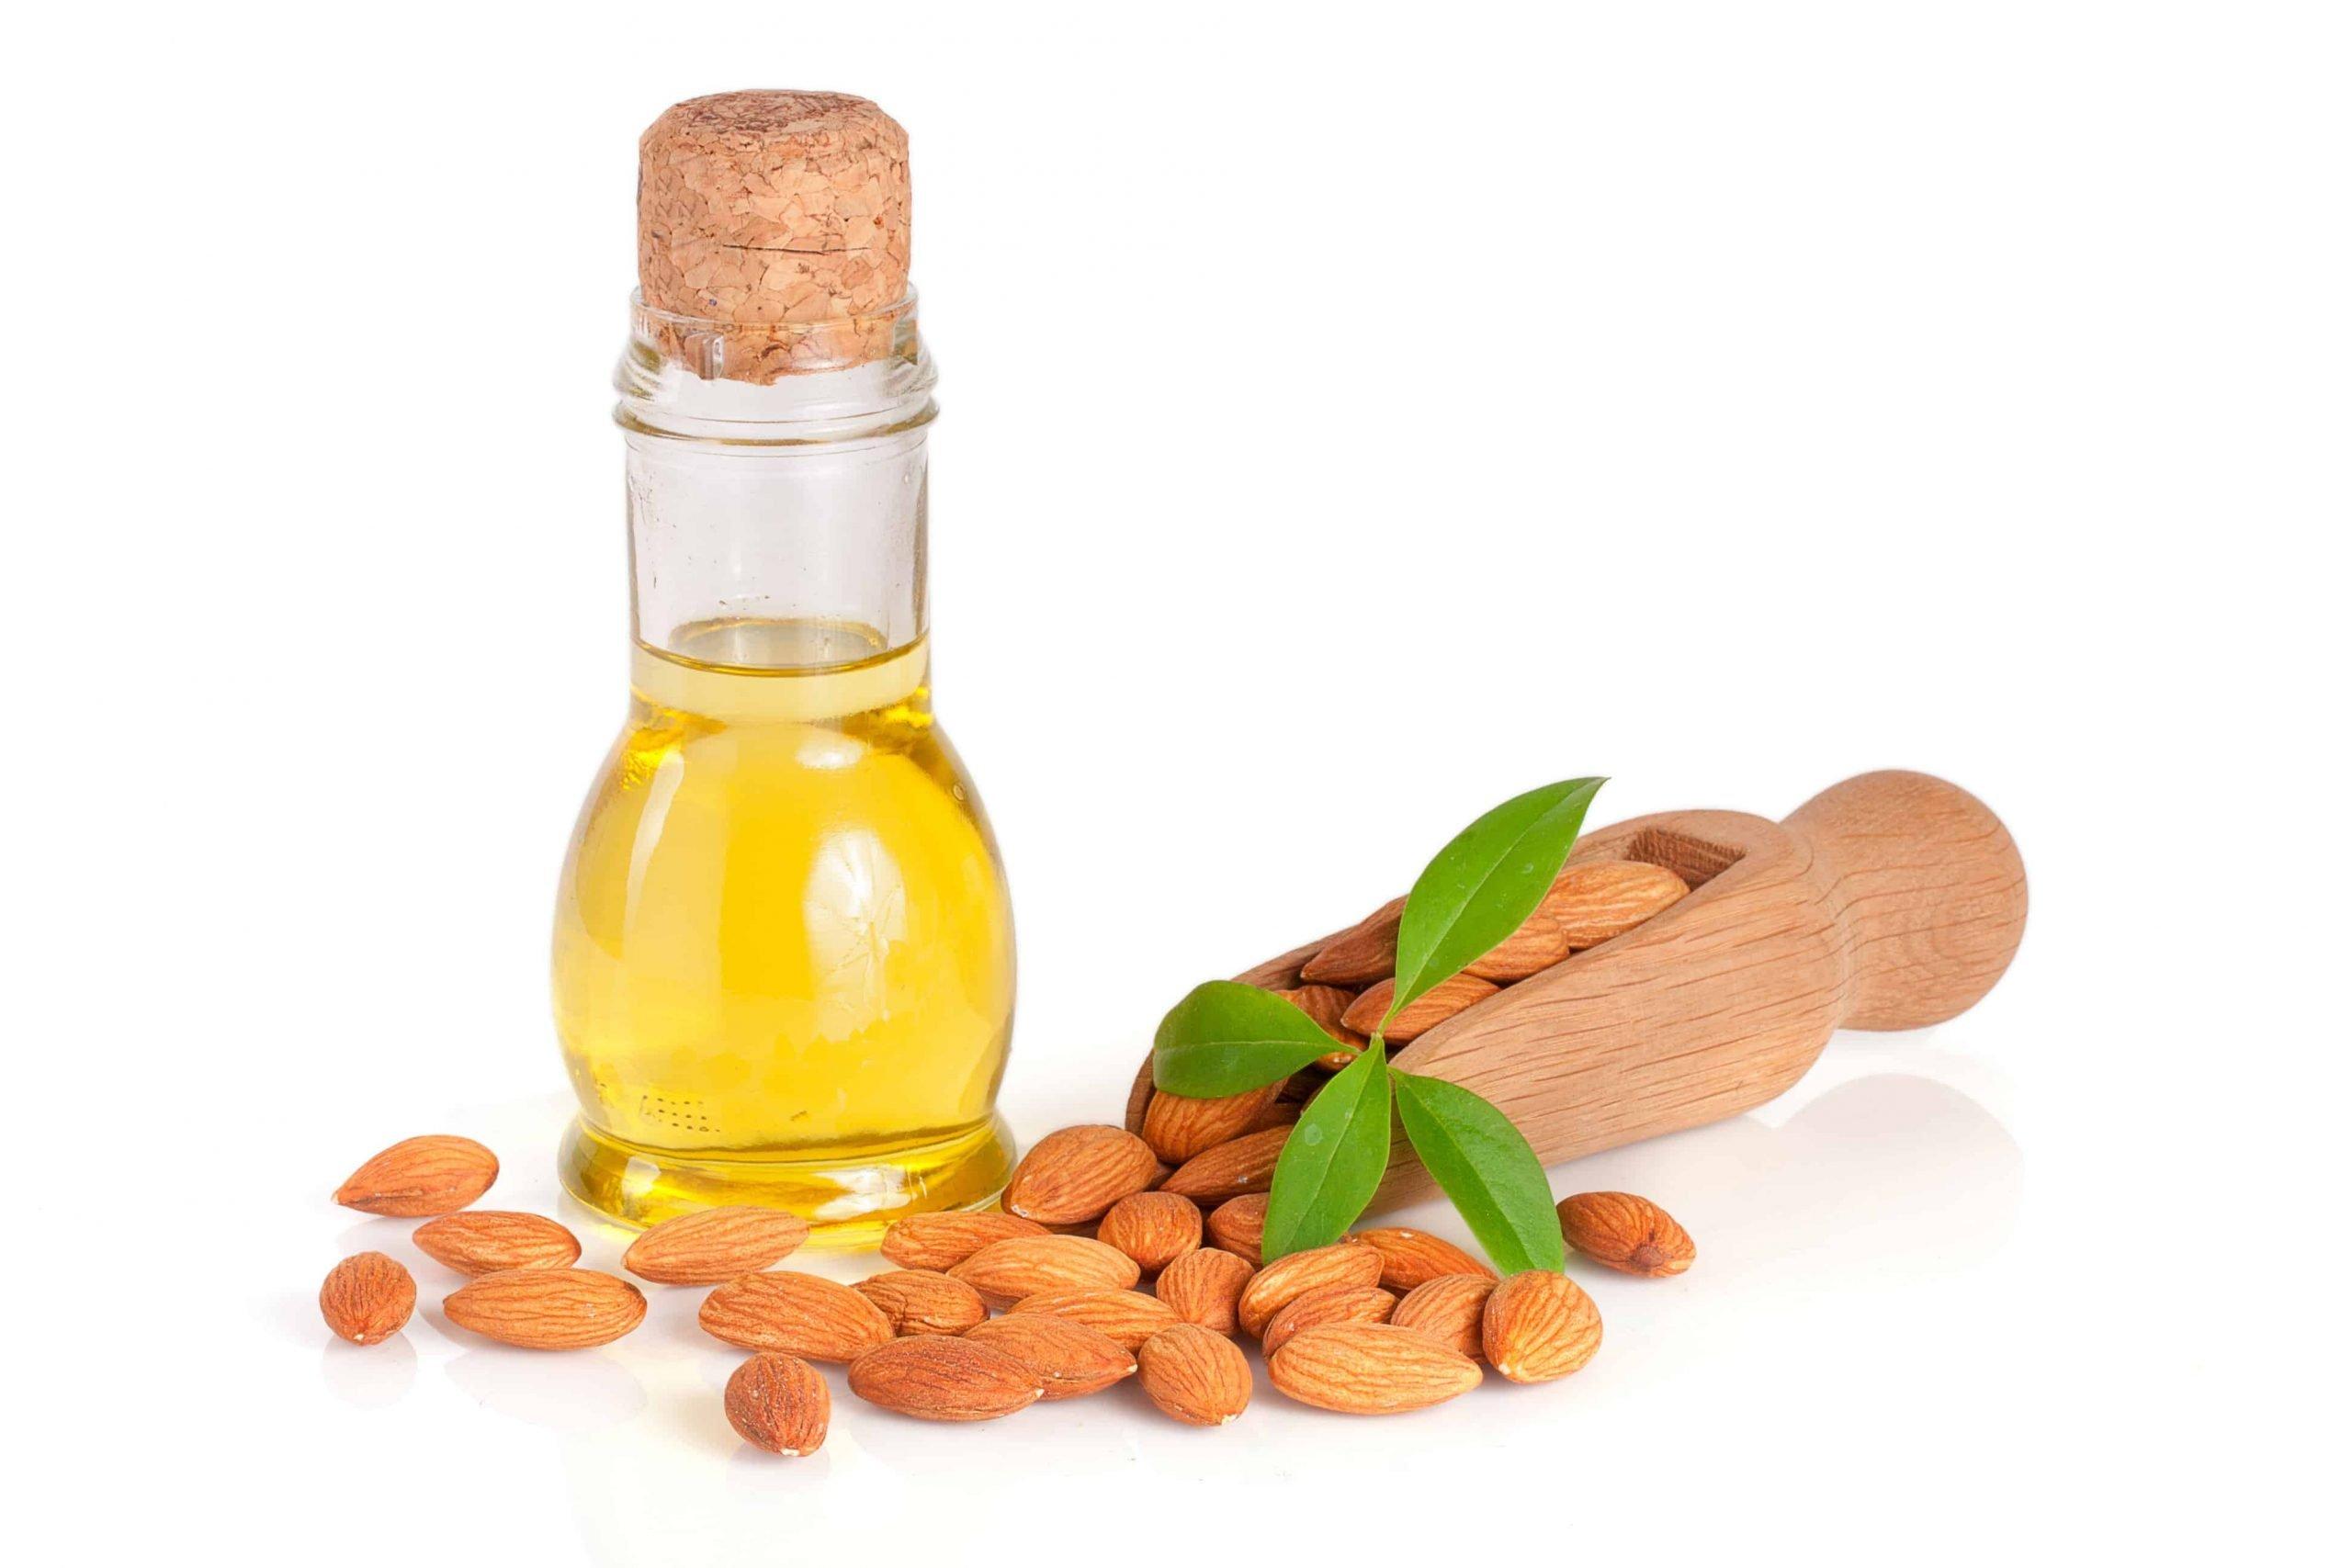 Sweet almond oil benefits